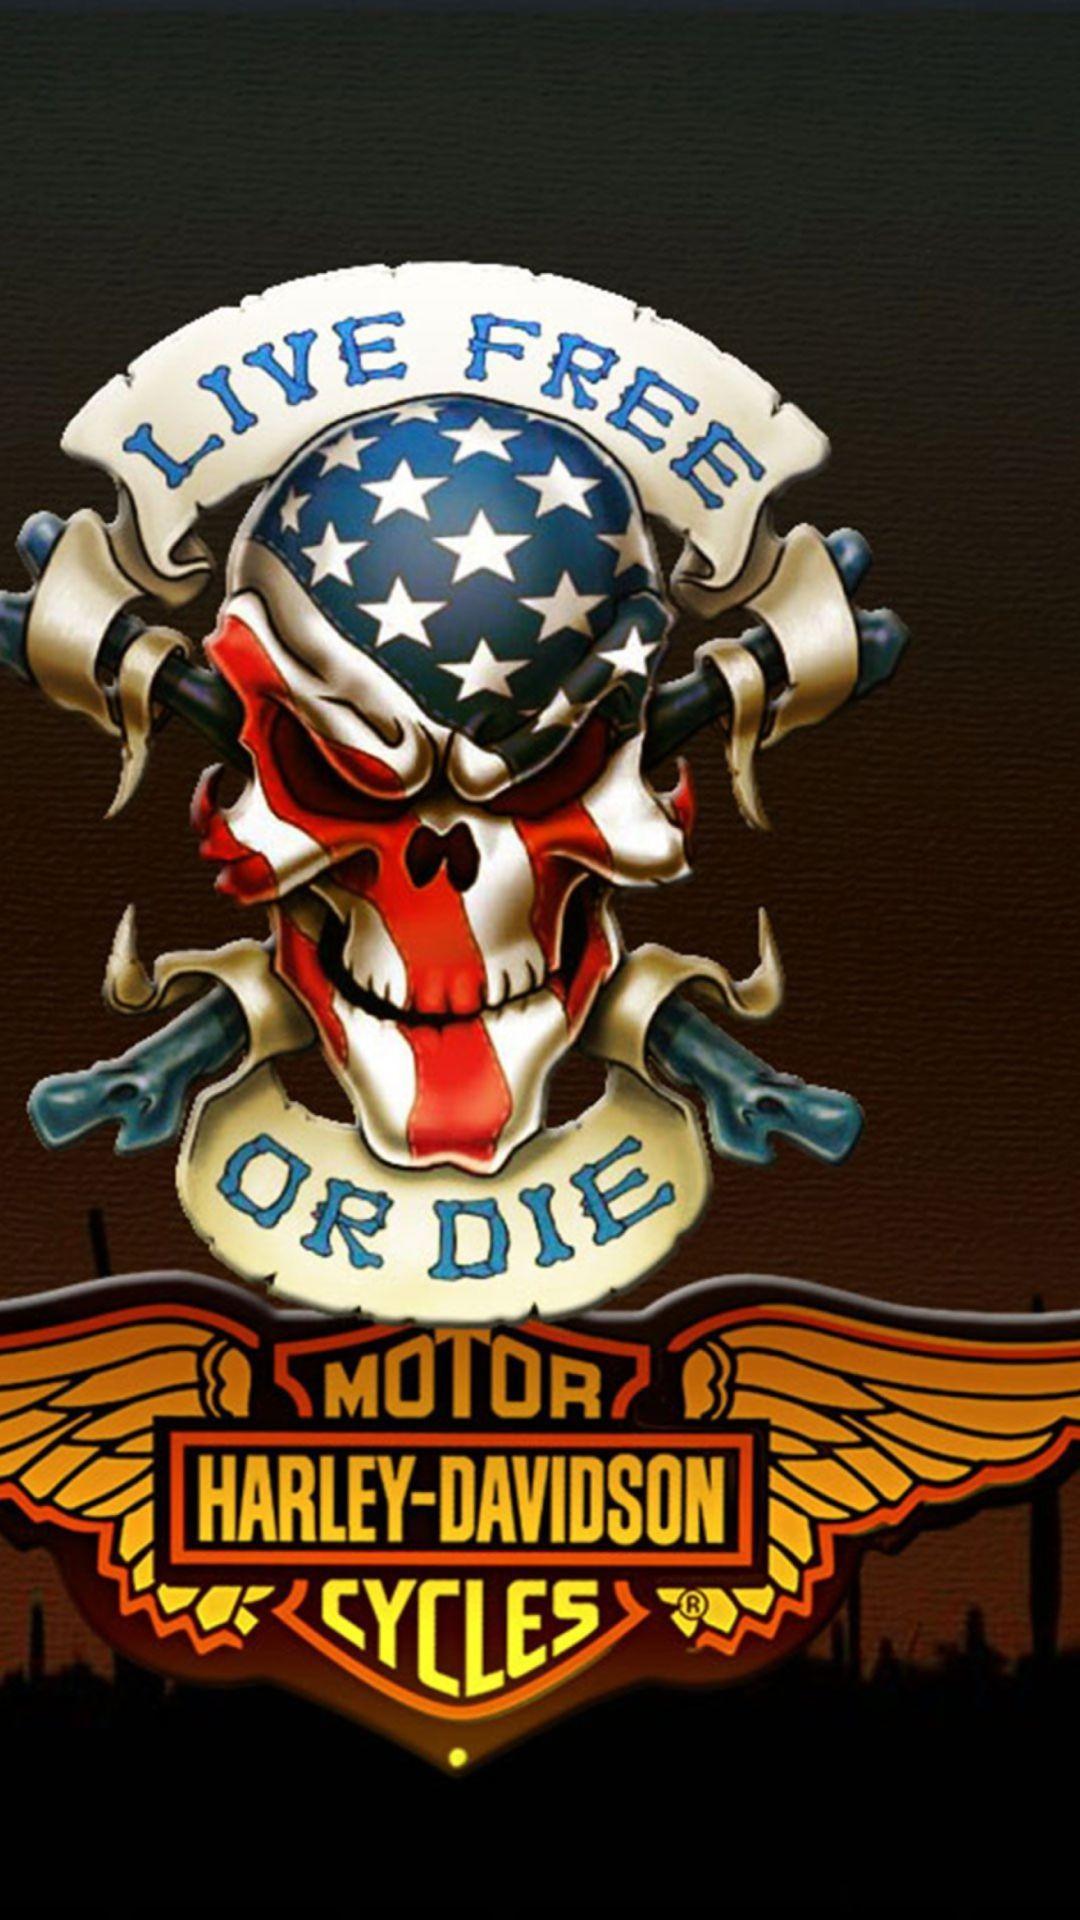 Harley Davidson Wallpapers - Top Free